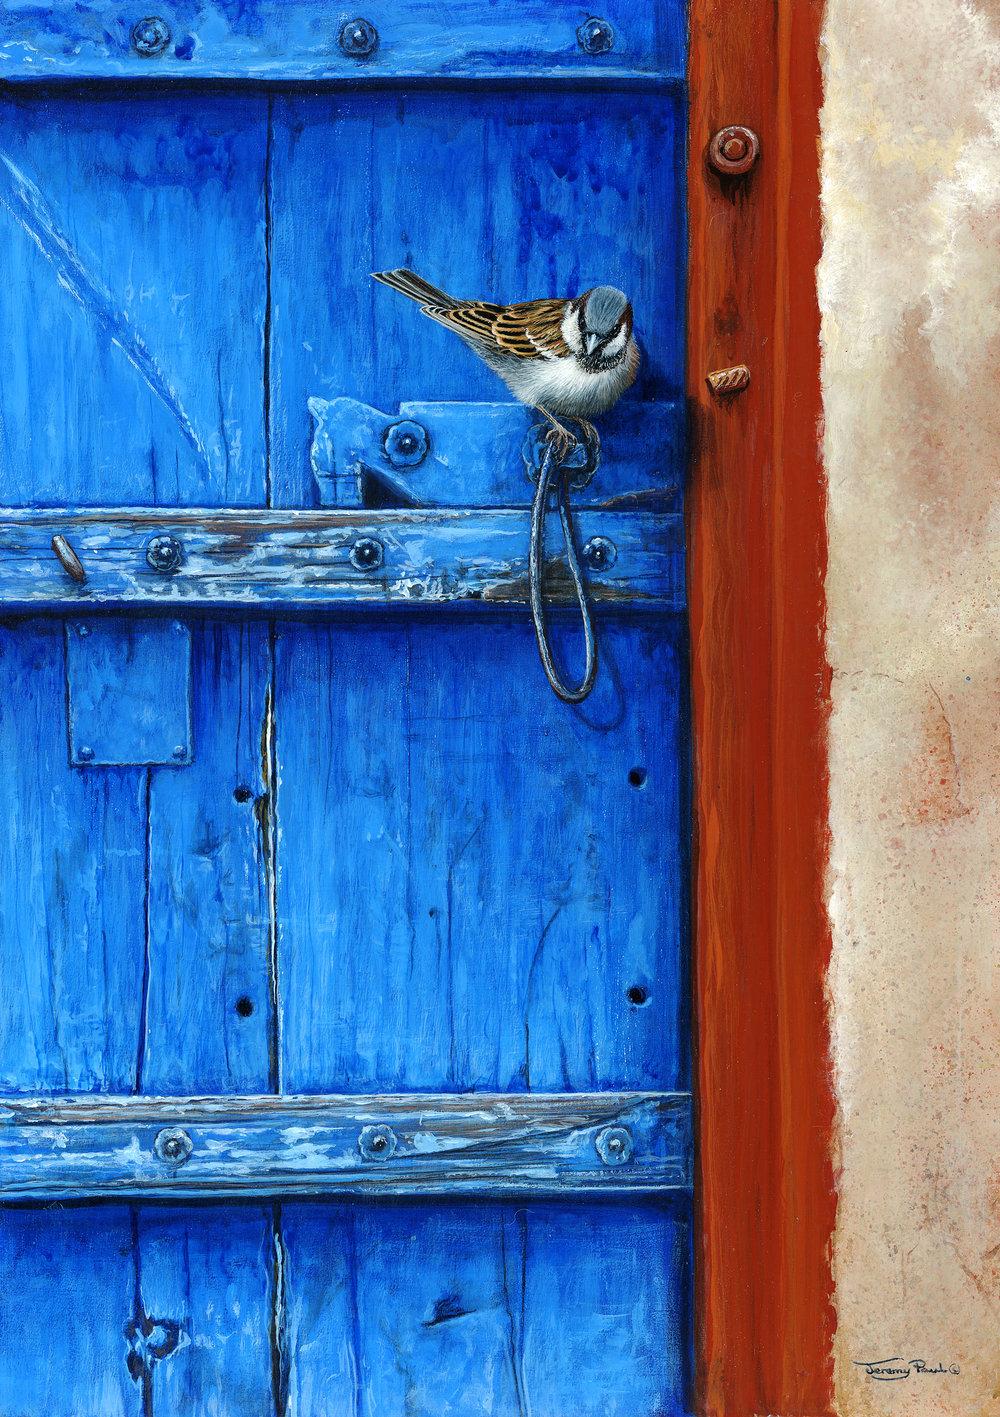 Sparrow---Rajasthan-door --Jeremy Paul 16x12.jpg